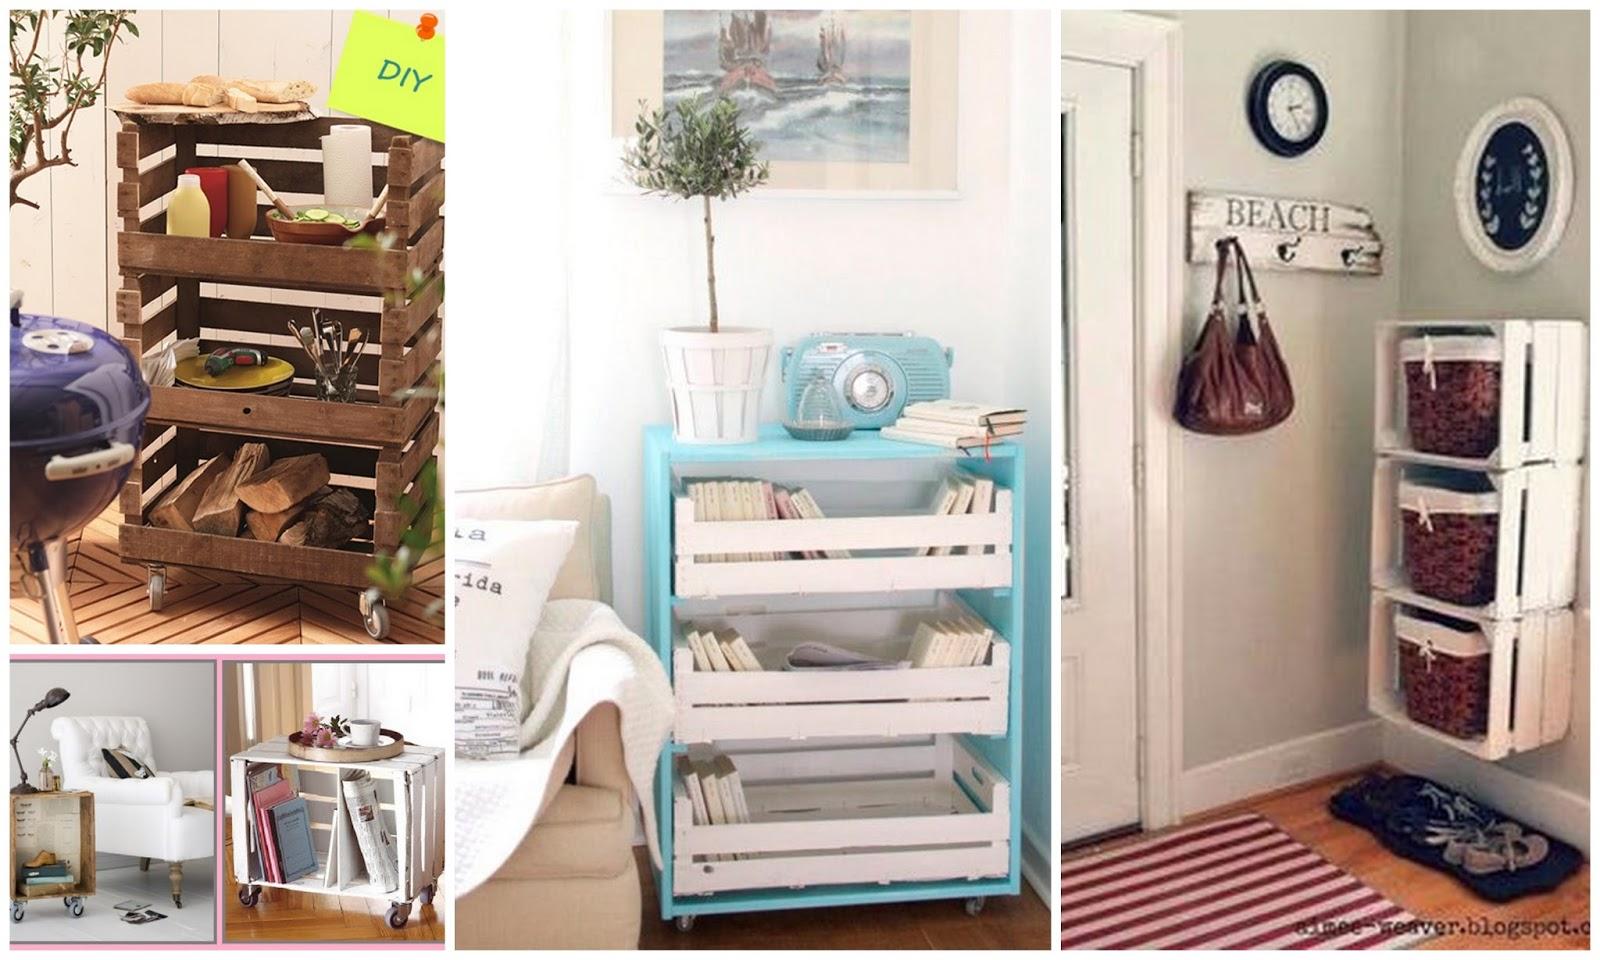 Dolce hogar decorar con cajas de madera for Dormitorio para 4 personas